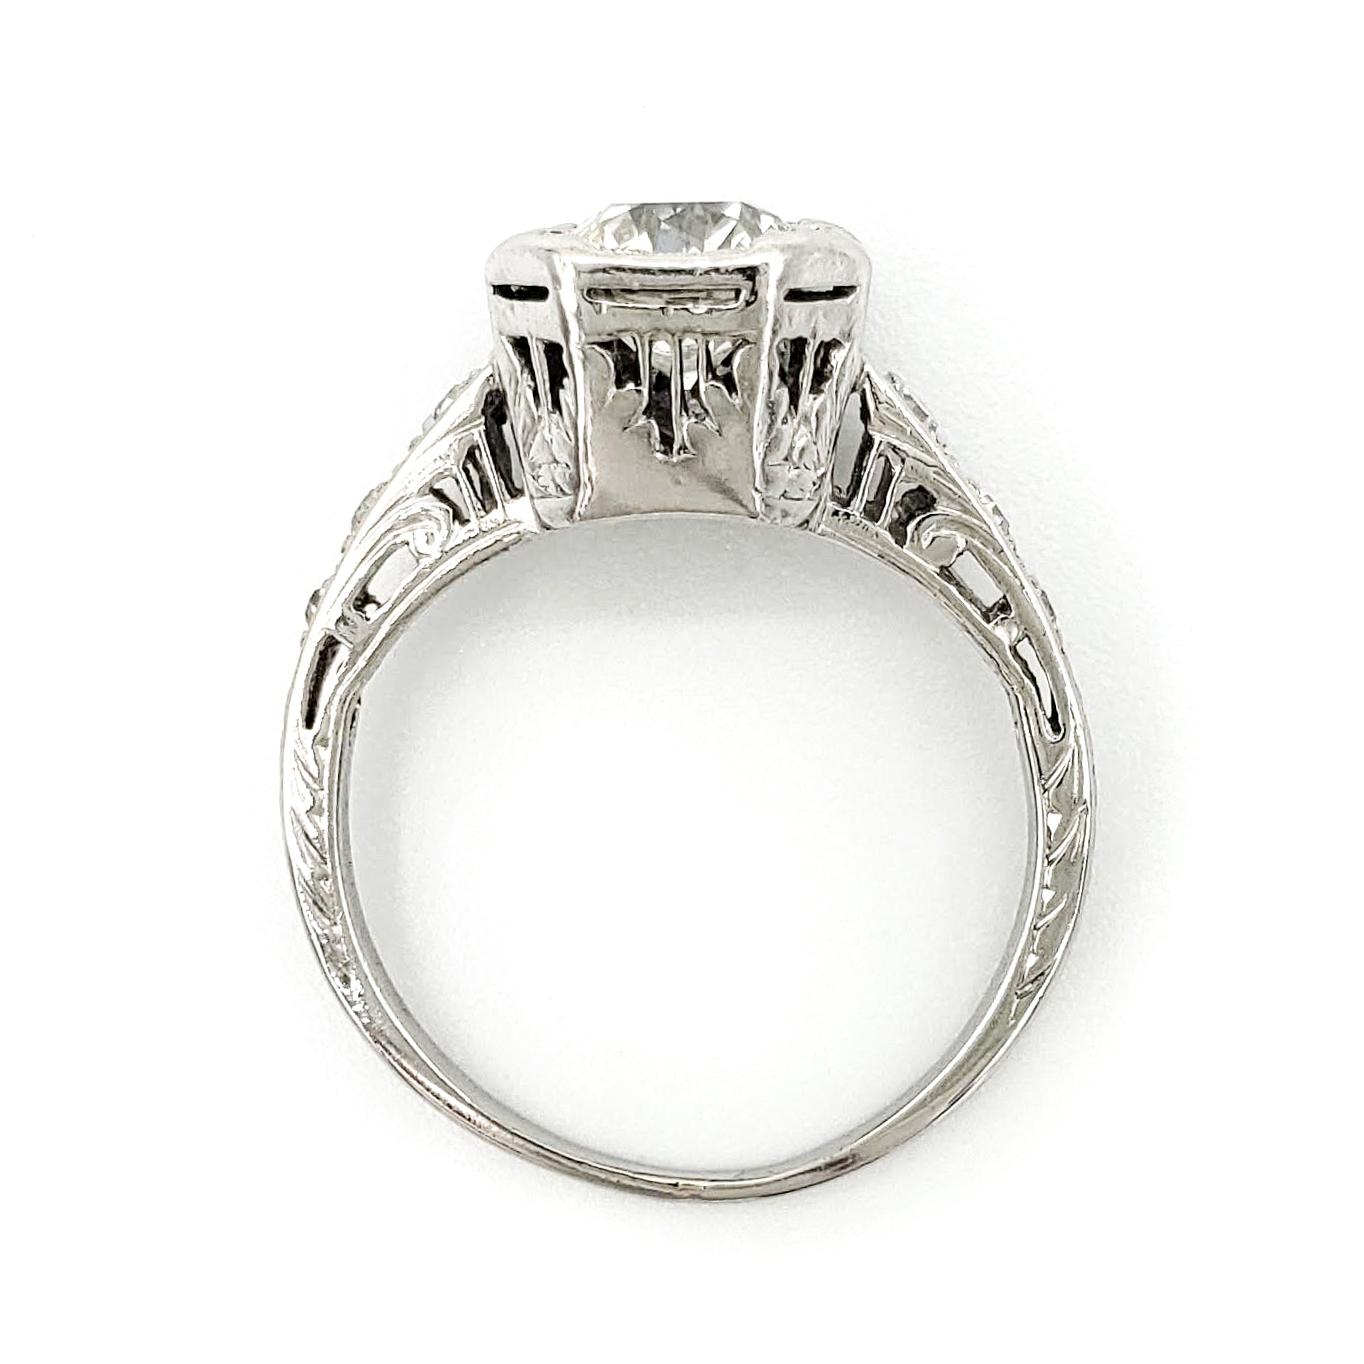 vintage-platinum-engagement-ring-with-0-93-carat-old-european-cut-diamond-egl-h-vs1